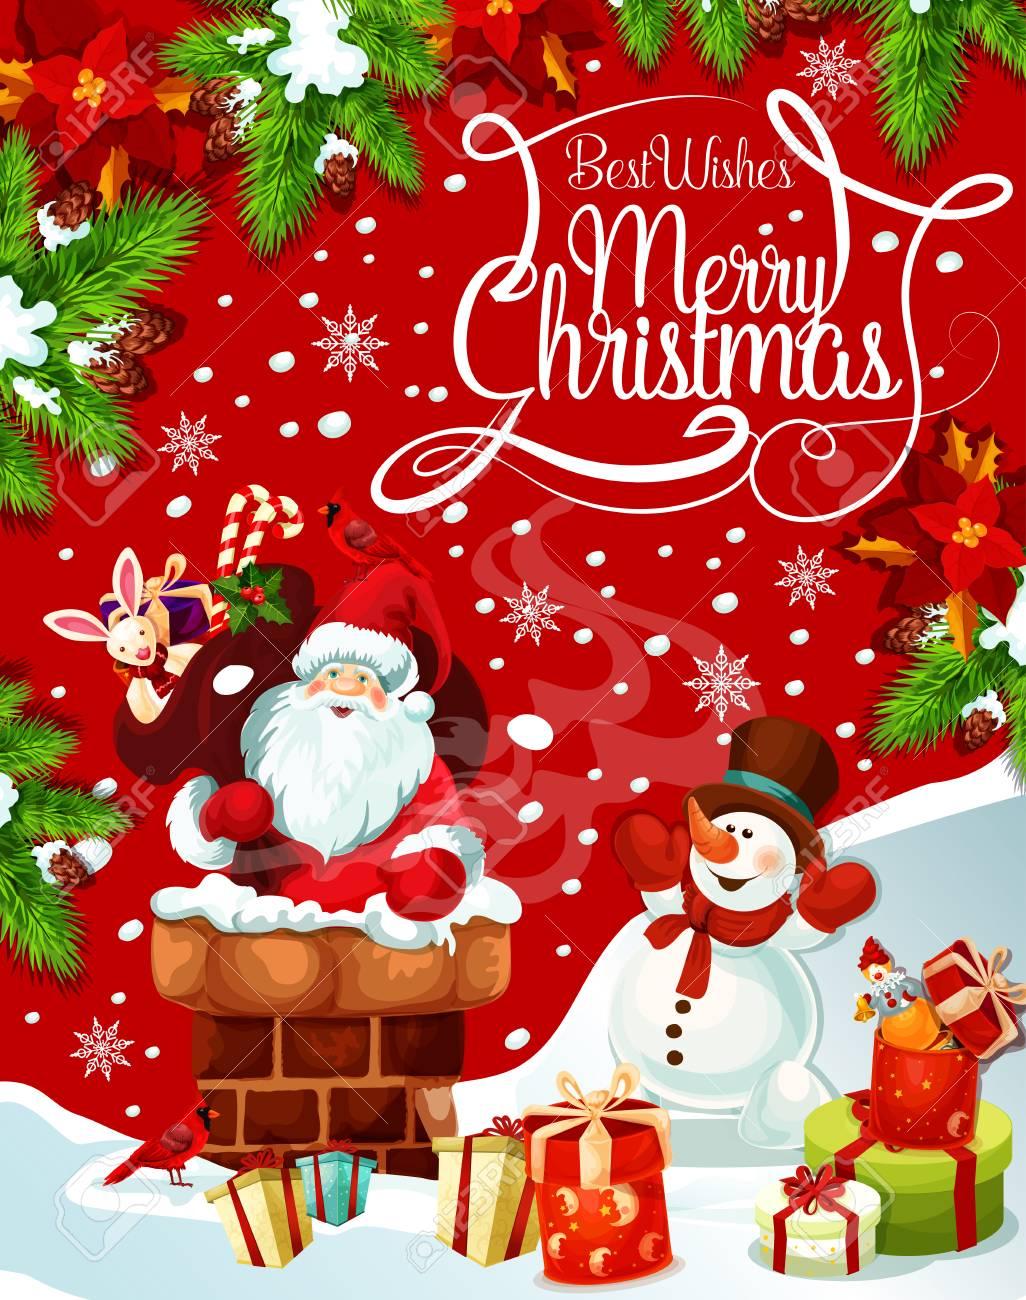 Merry christmas santa gifts tree vector greeting royalty free merry christmas santa gifts tree vector greeting stock vector 88317531 m4hsunfo